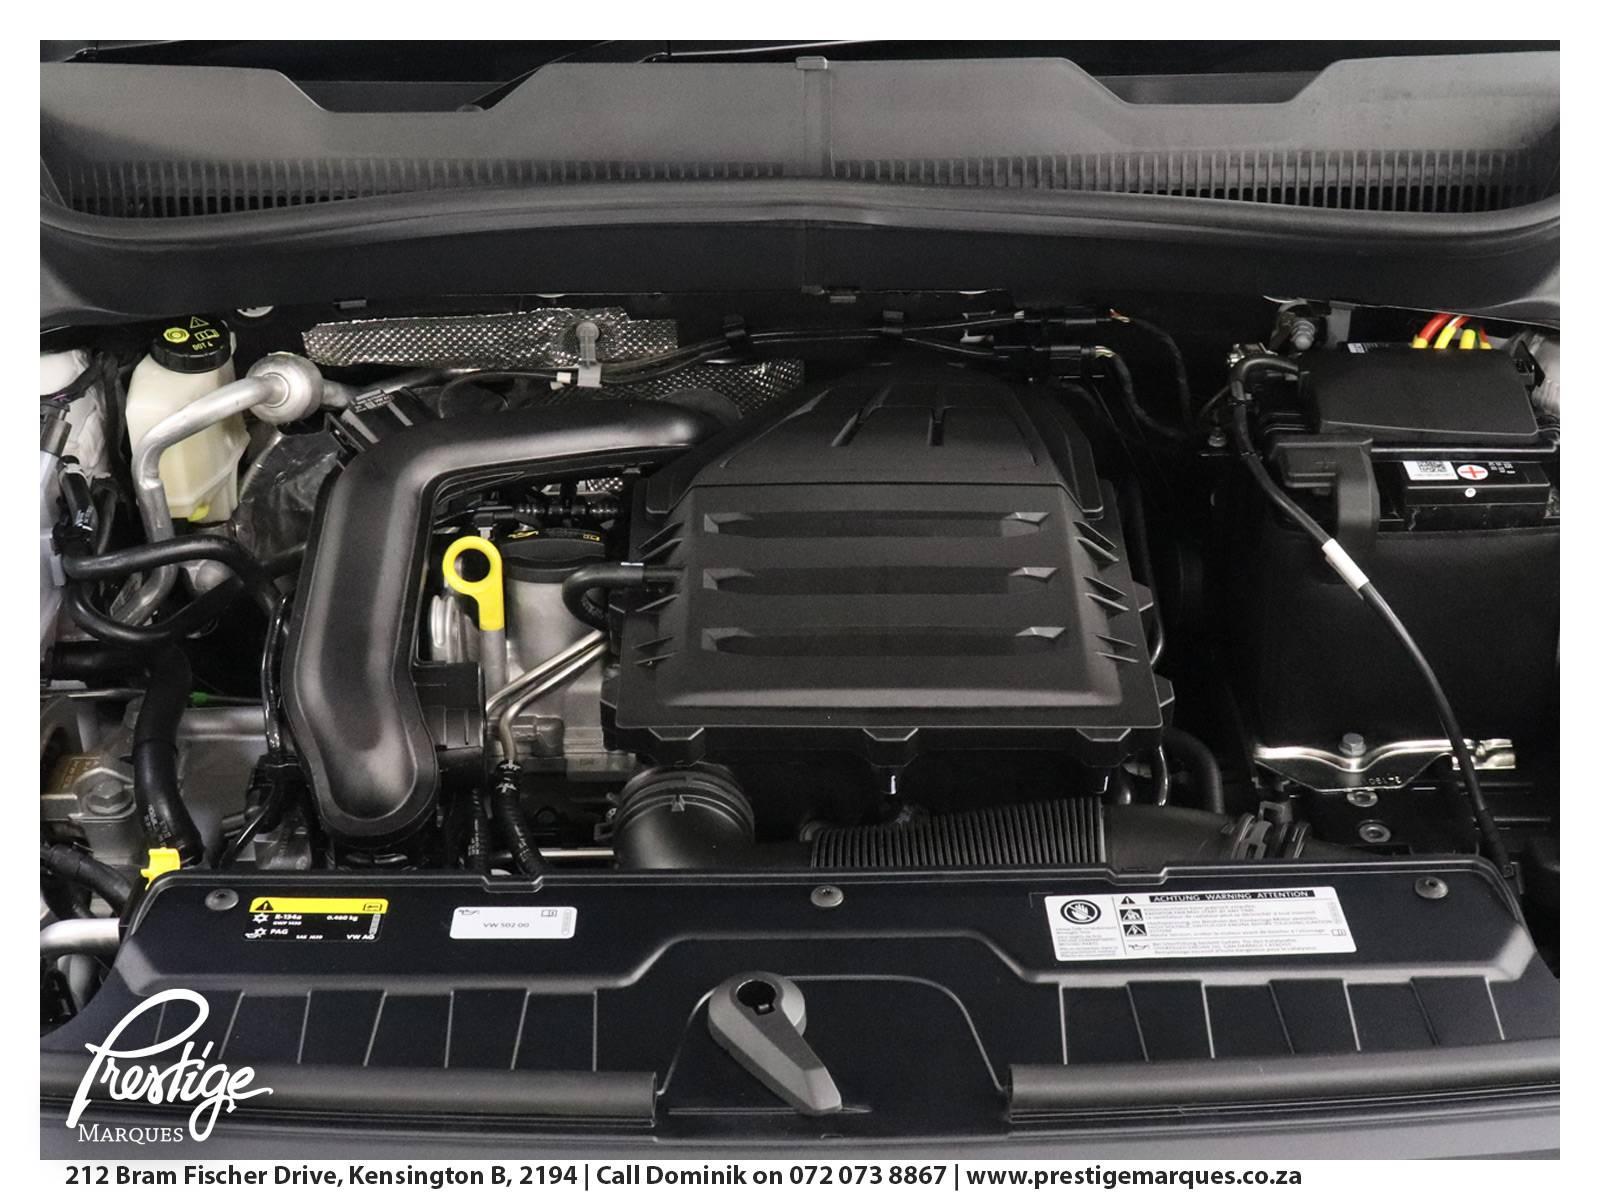 2019-Volkswagen-T-Cross-Prestige-Marques-Randburg-Sandton-9